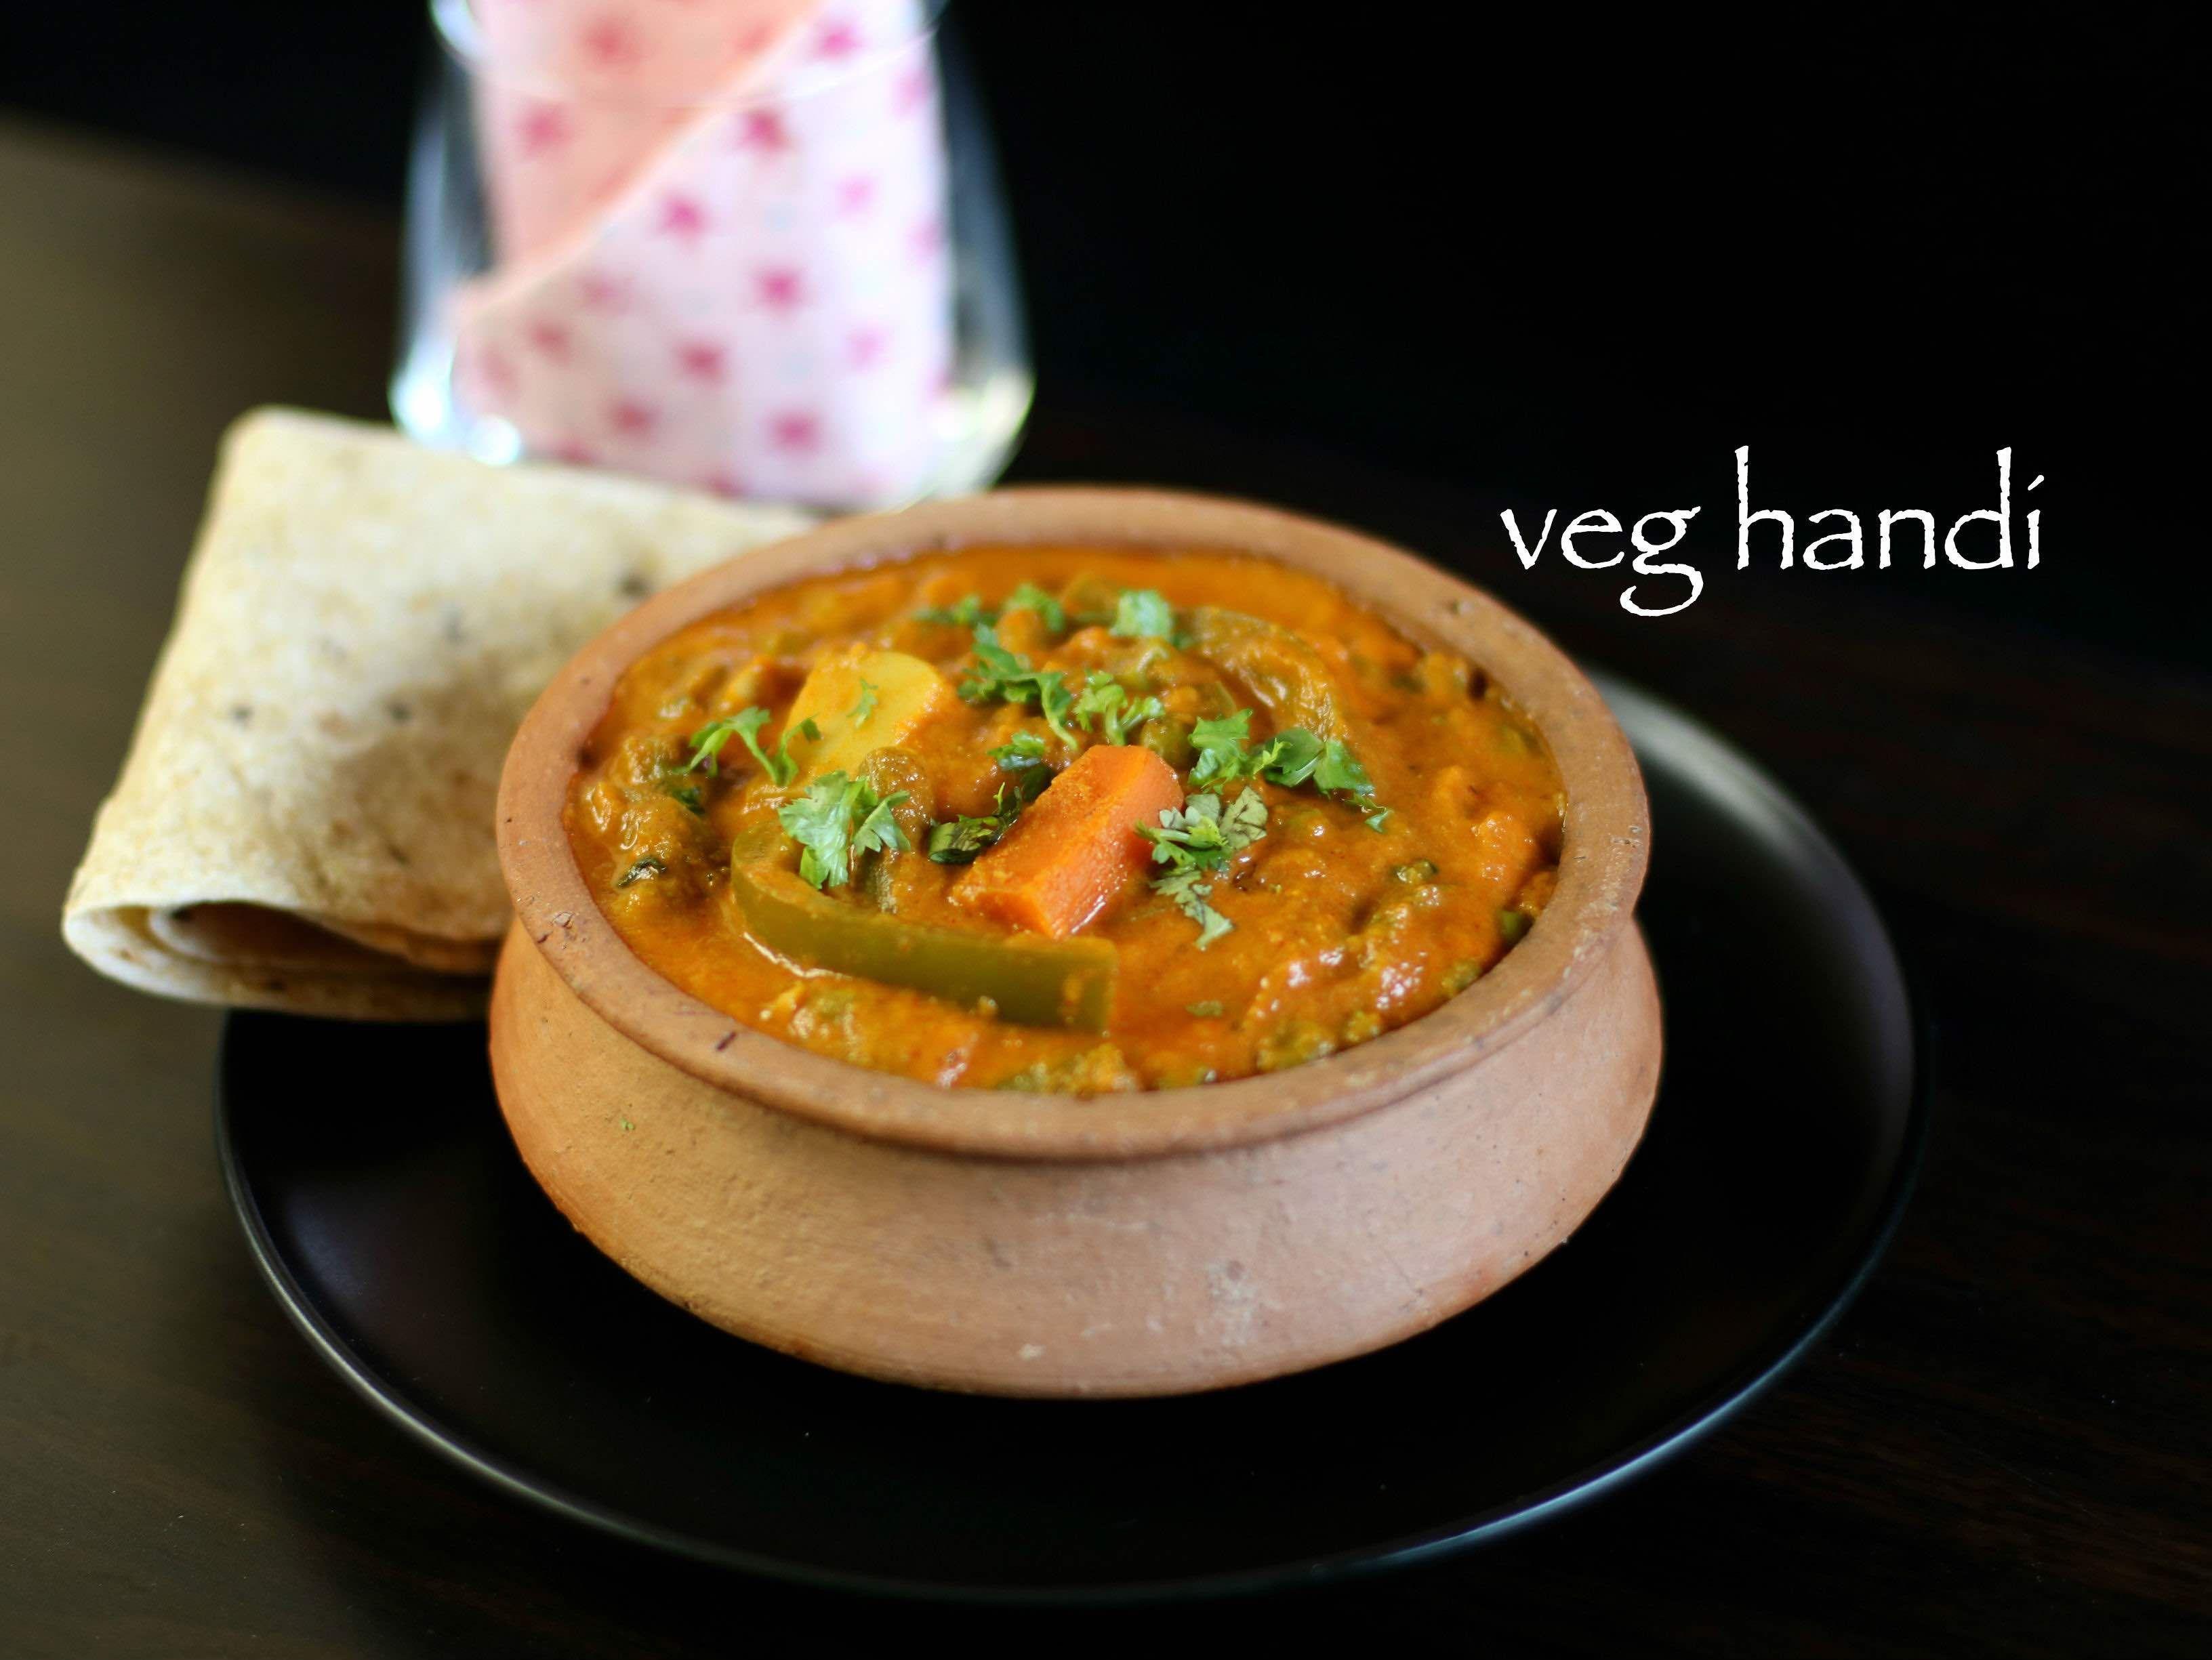 Veg handi recipe veg diwani handi recipe mixed vegetable handi food forumfinder Choice Image